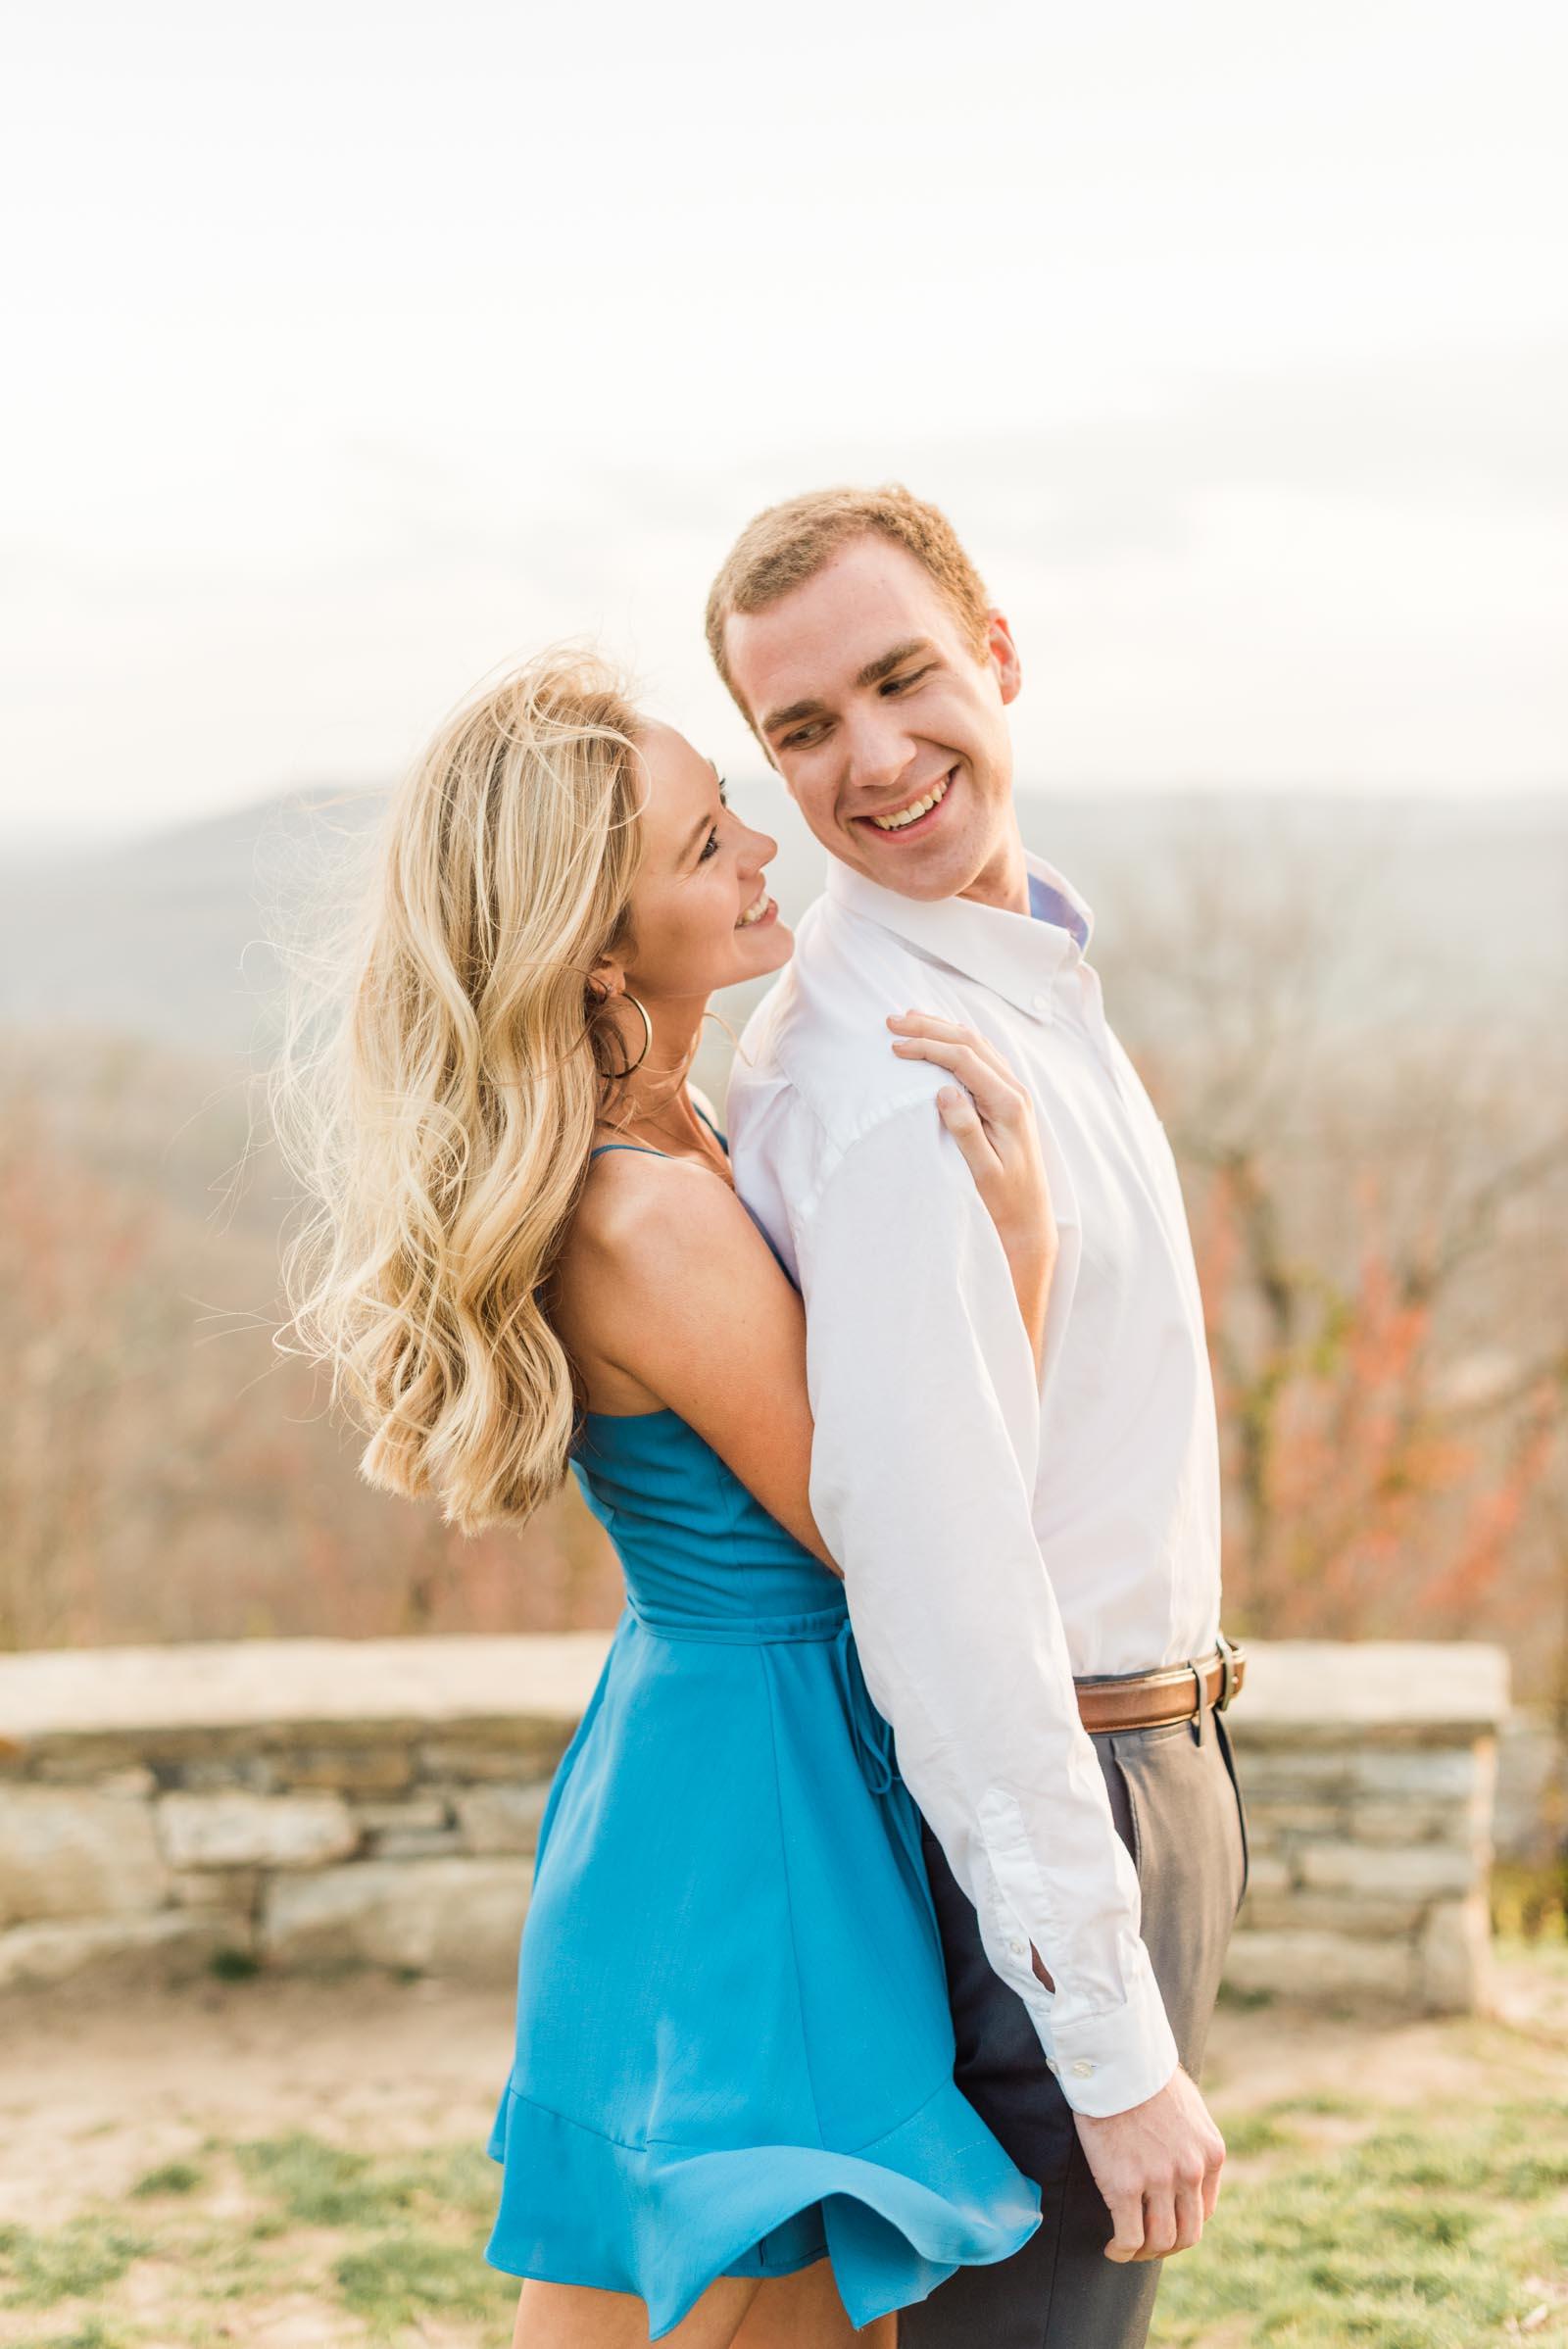 Sunset Mountain Engagement in North Carolina Morgan & Nathan Markie Walden Photography-15.jpg